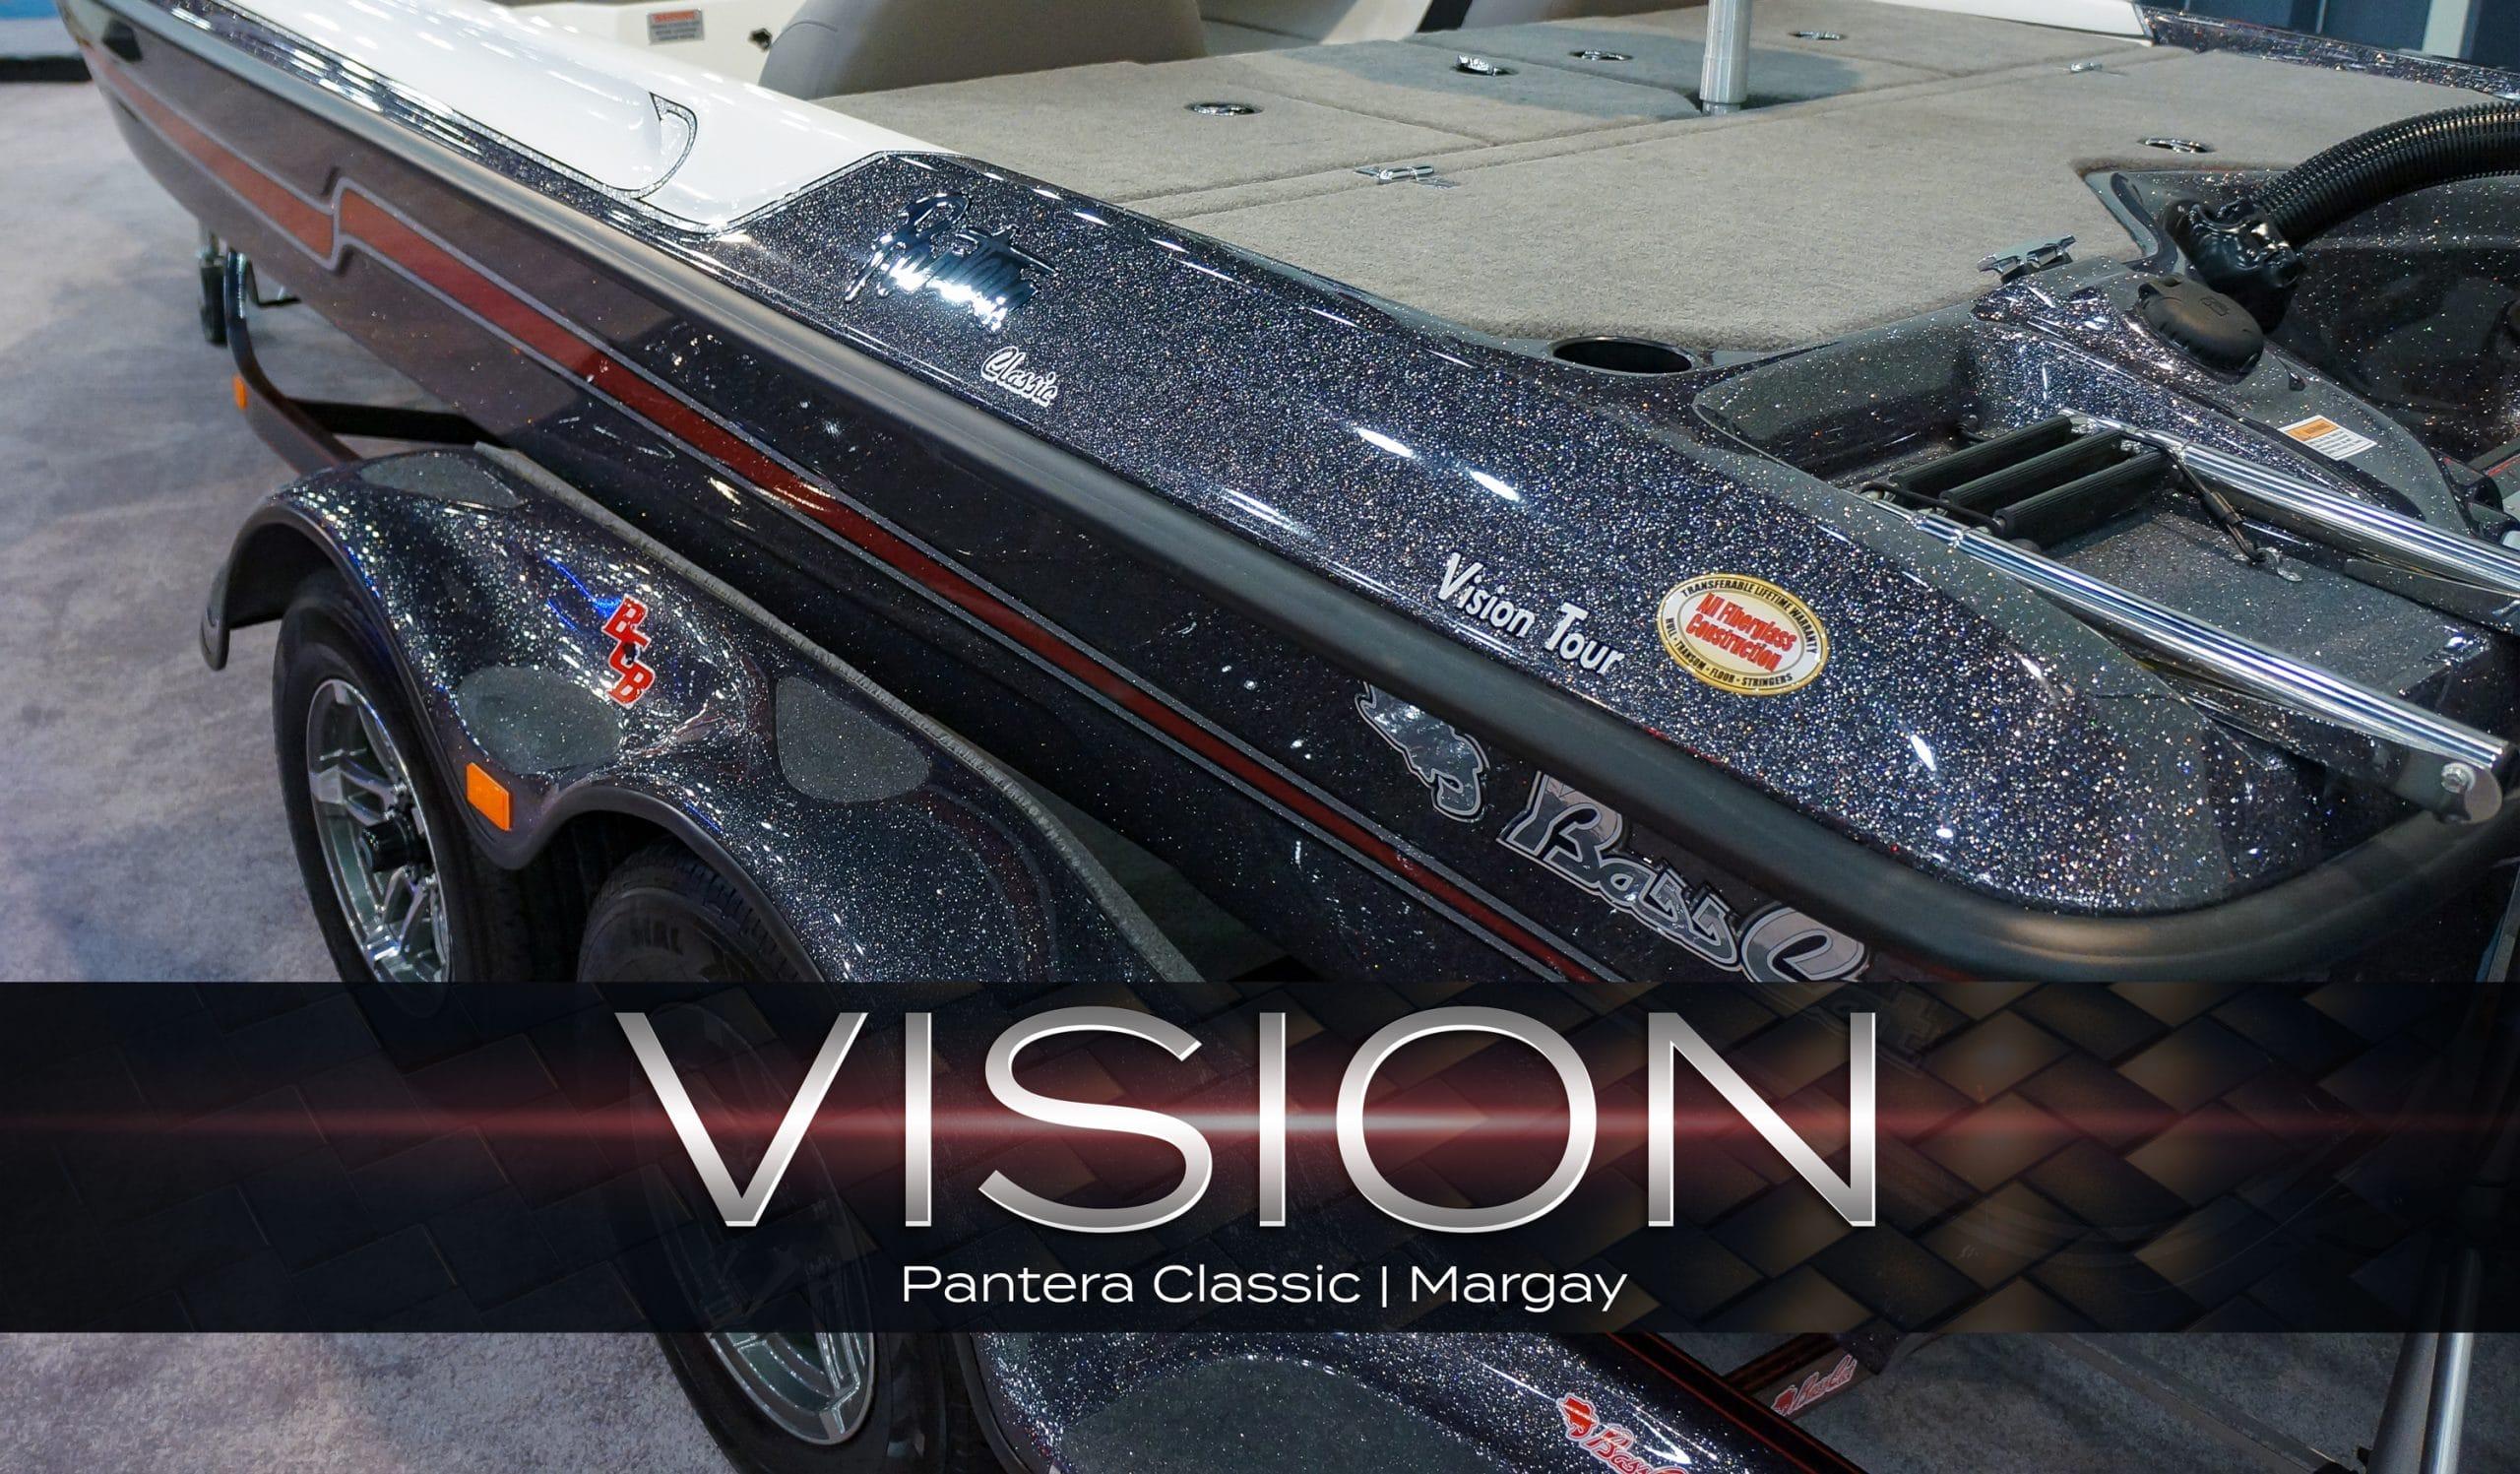 bass cat vision models